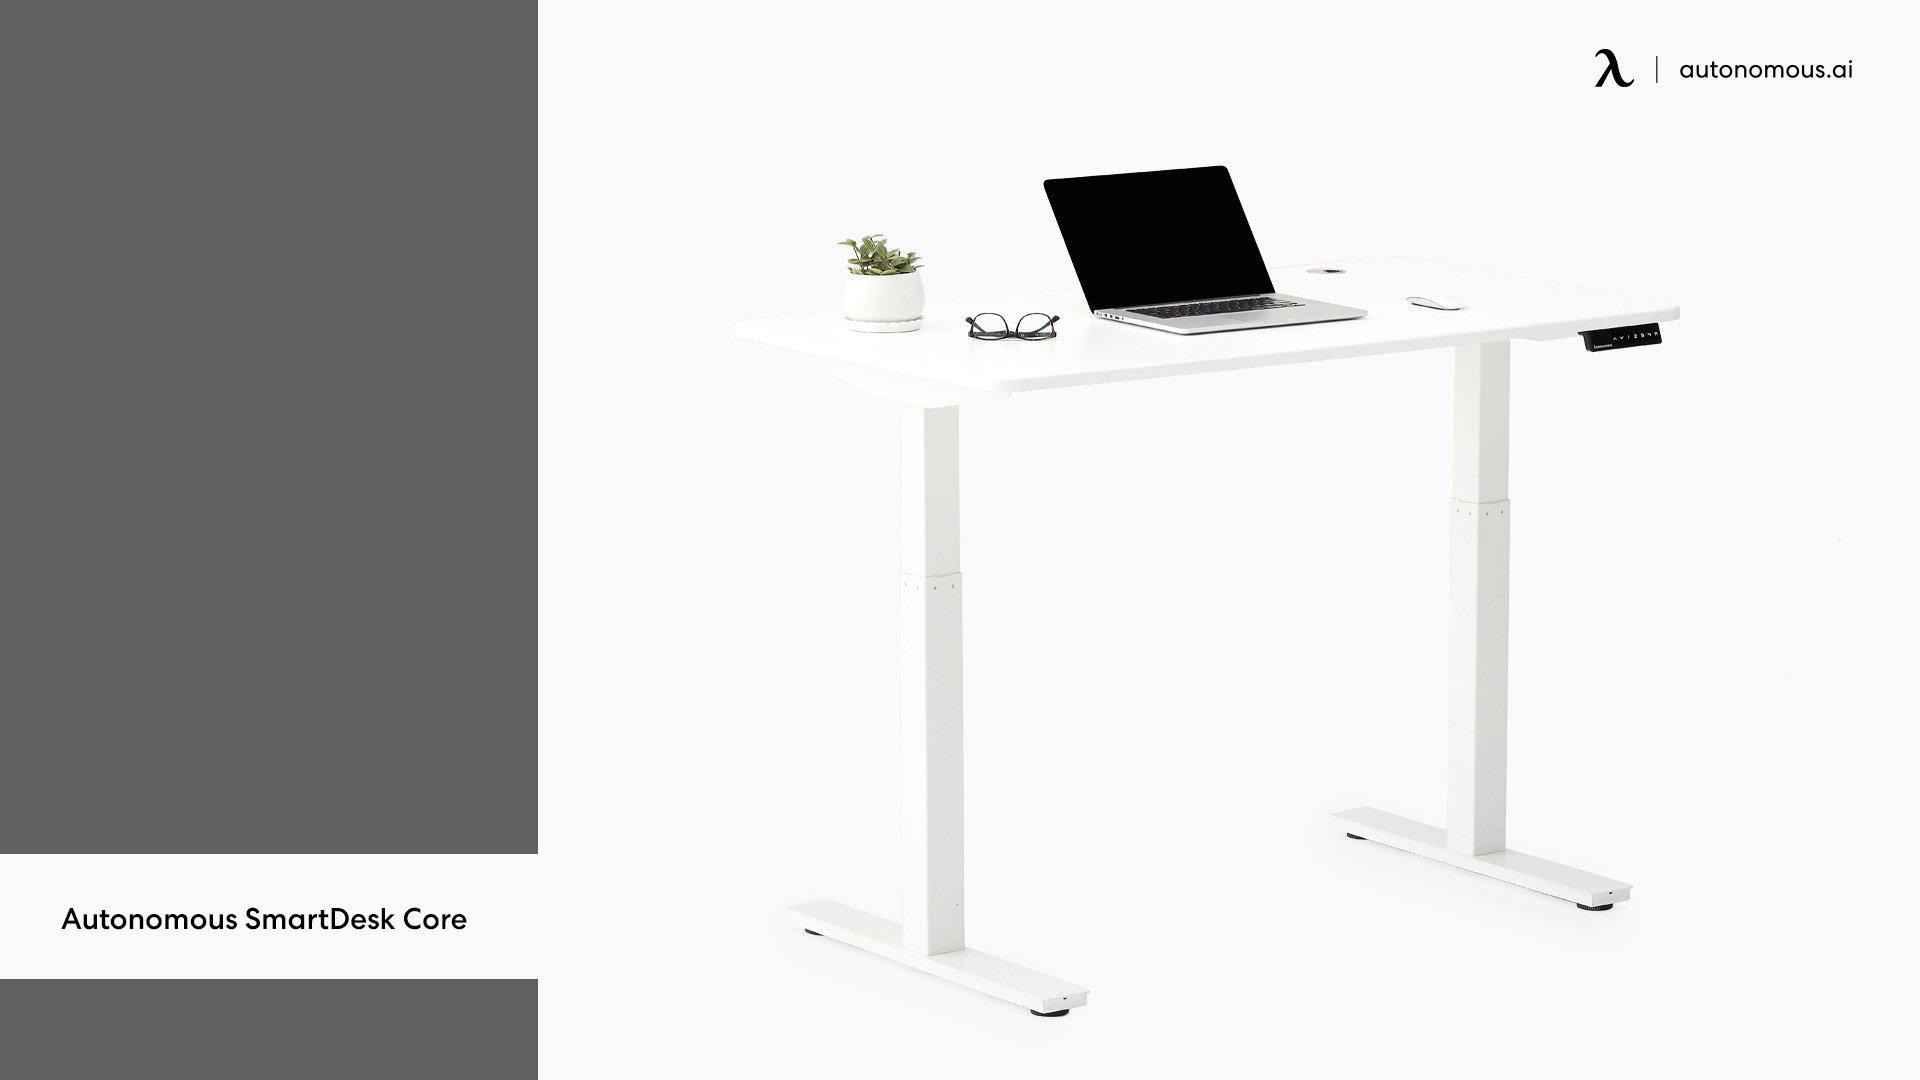 Autonomous SmartDesk Core (SmartDesk Home Office)